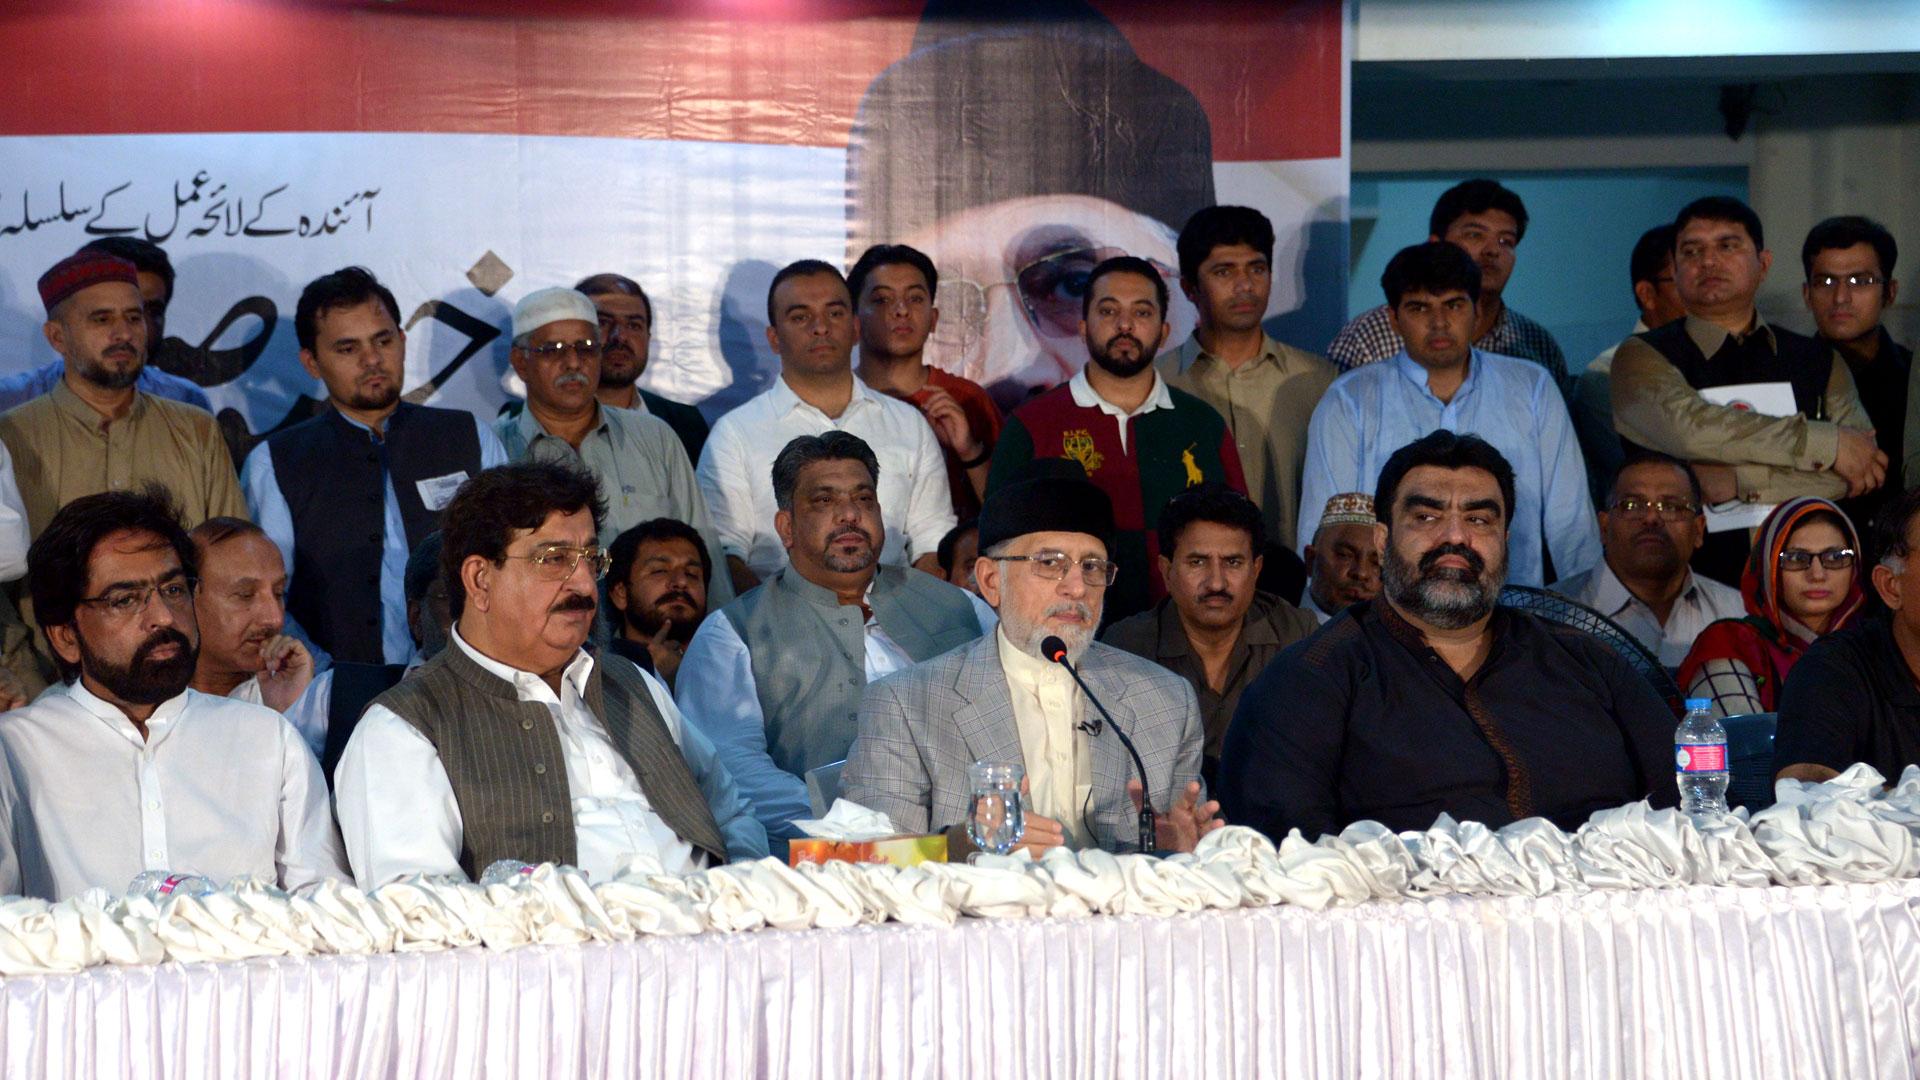 'Tehreek-e-Qisas' to be launched against culprits of Model Town Massacre: Dr Tahir-ul-Qadri